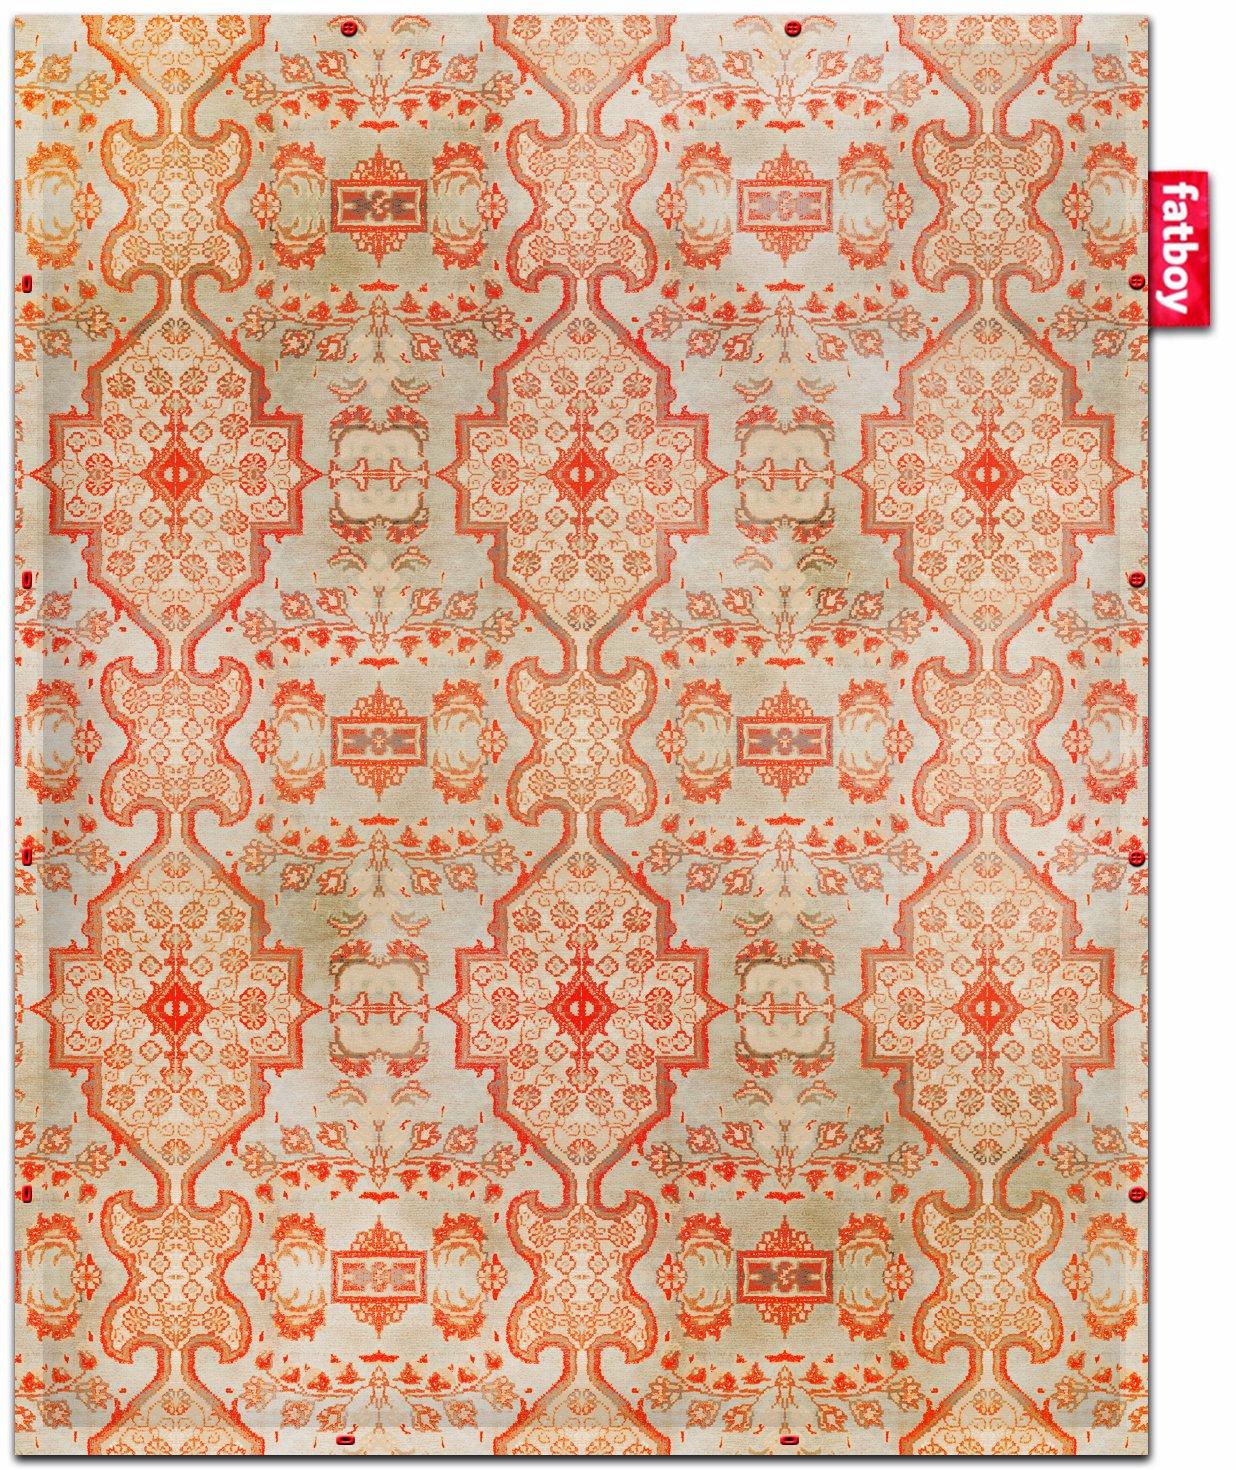 Fatboy 900.6402. Teppich Non Flying Carpet Small Persian Orange: Amazon.de:  Küche U0026 Haushalt